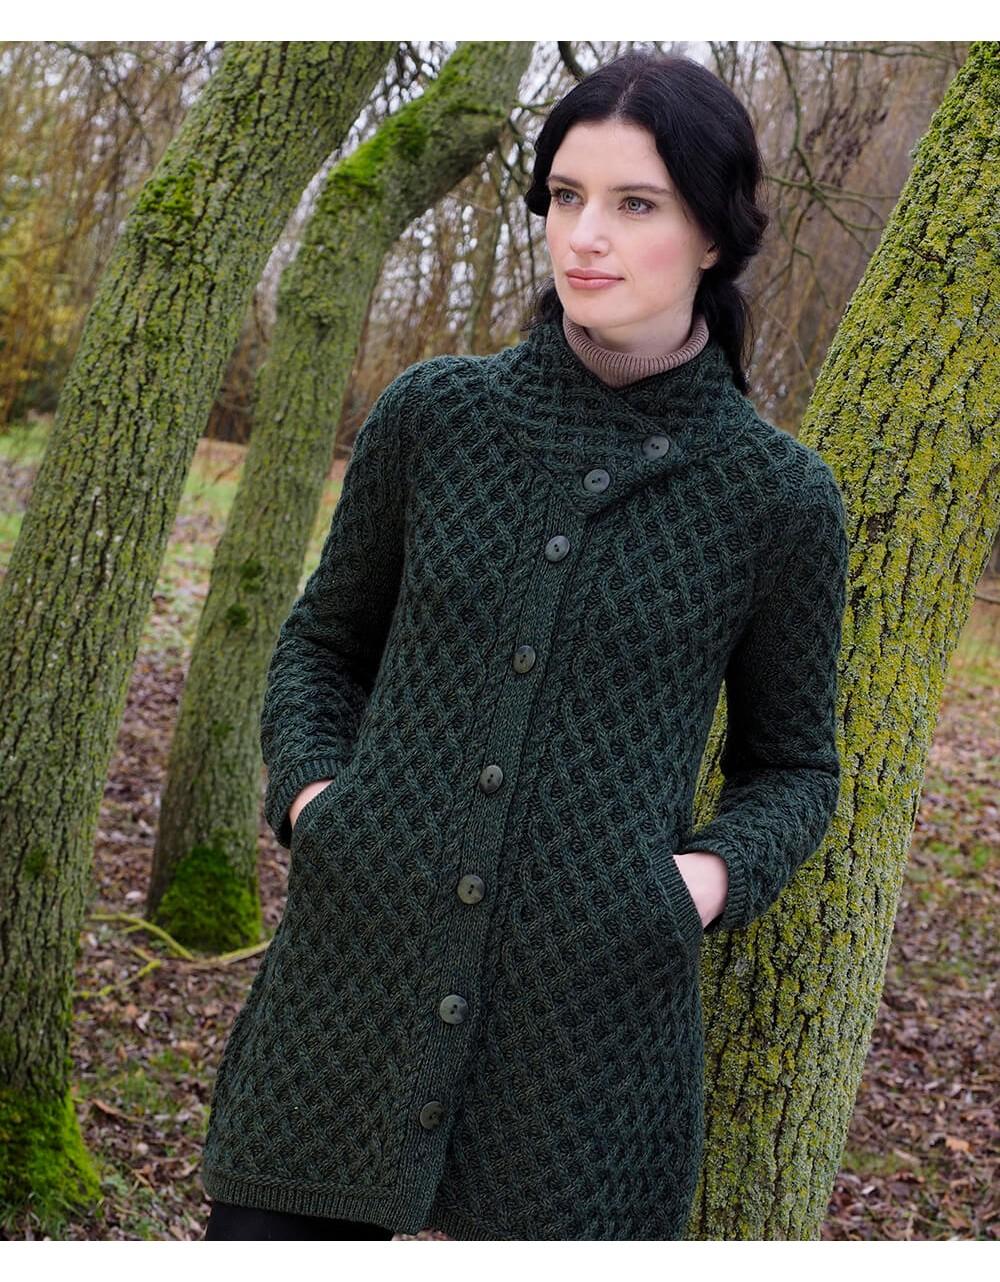 Aran Coatigan With Cross Over Collar|Aran Sweaters|Irish Handcrafts